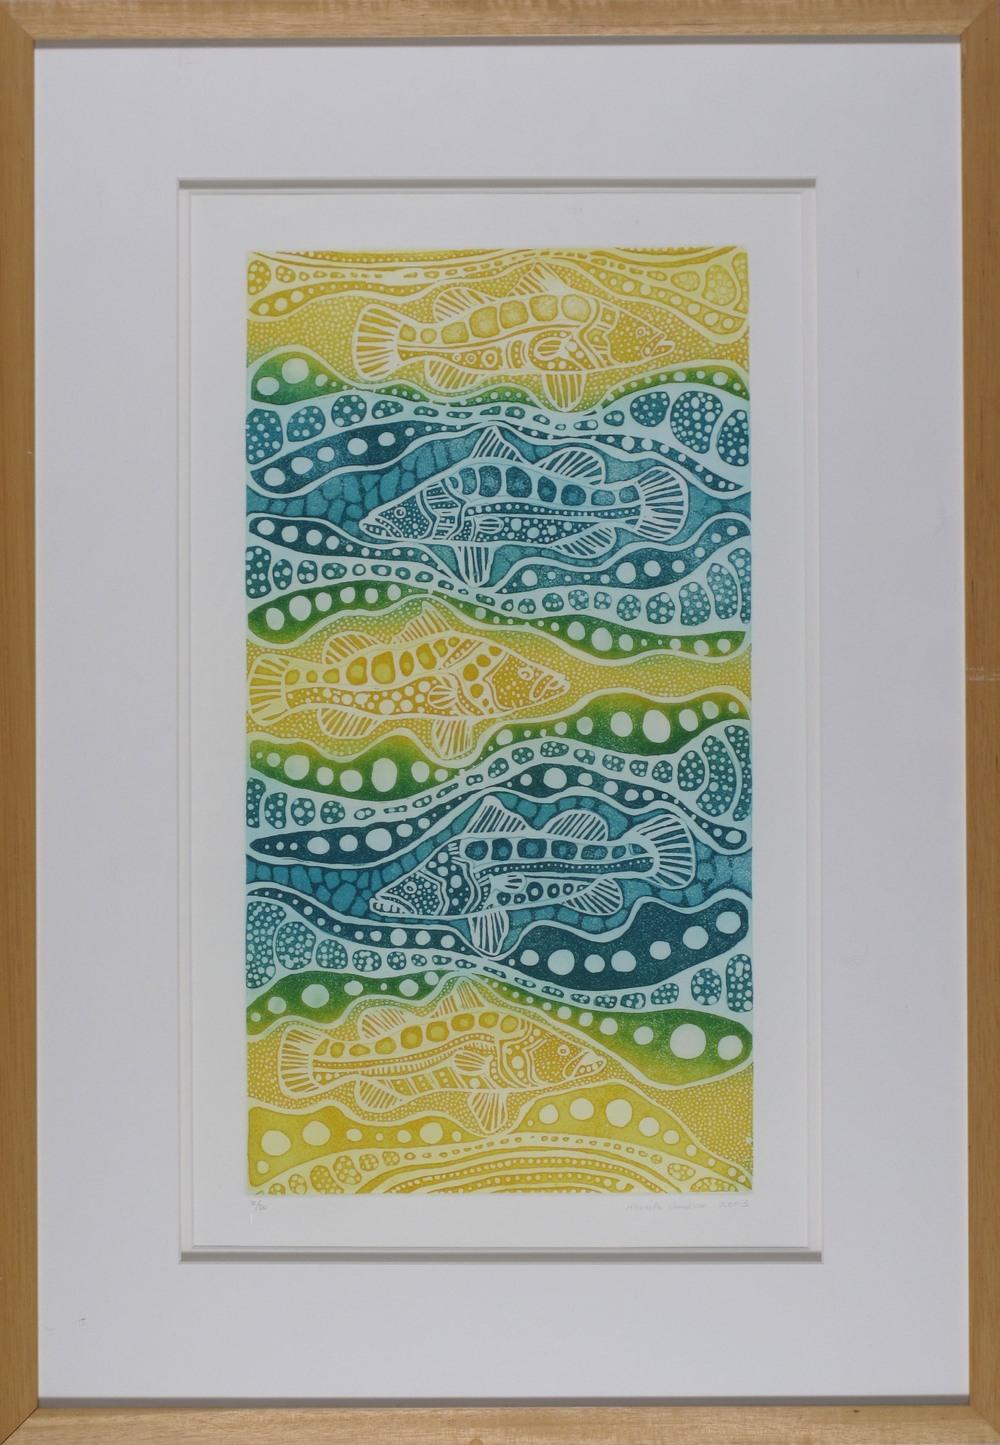 #4286. Marita Sambono. Barramundi. Etching on Paper. LE 10-20. 70cm x 49cm. Was $895 Now $447.50